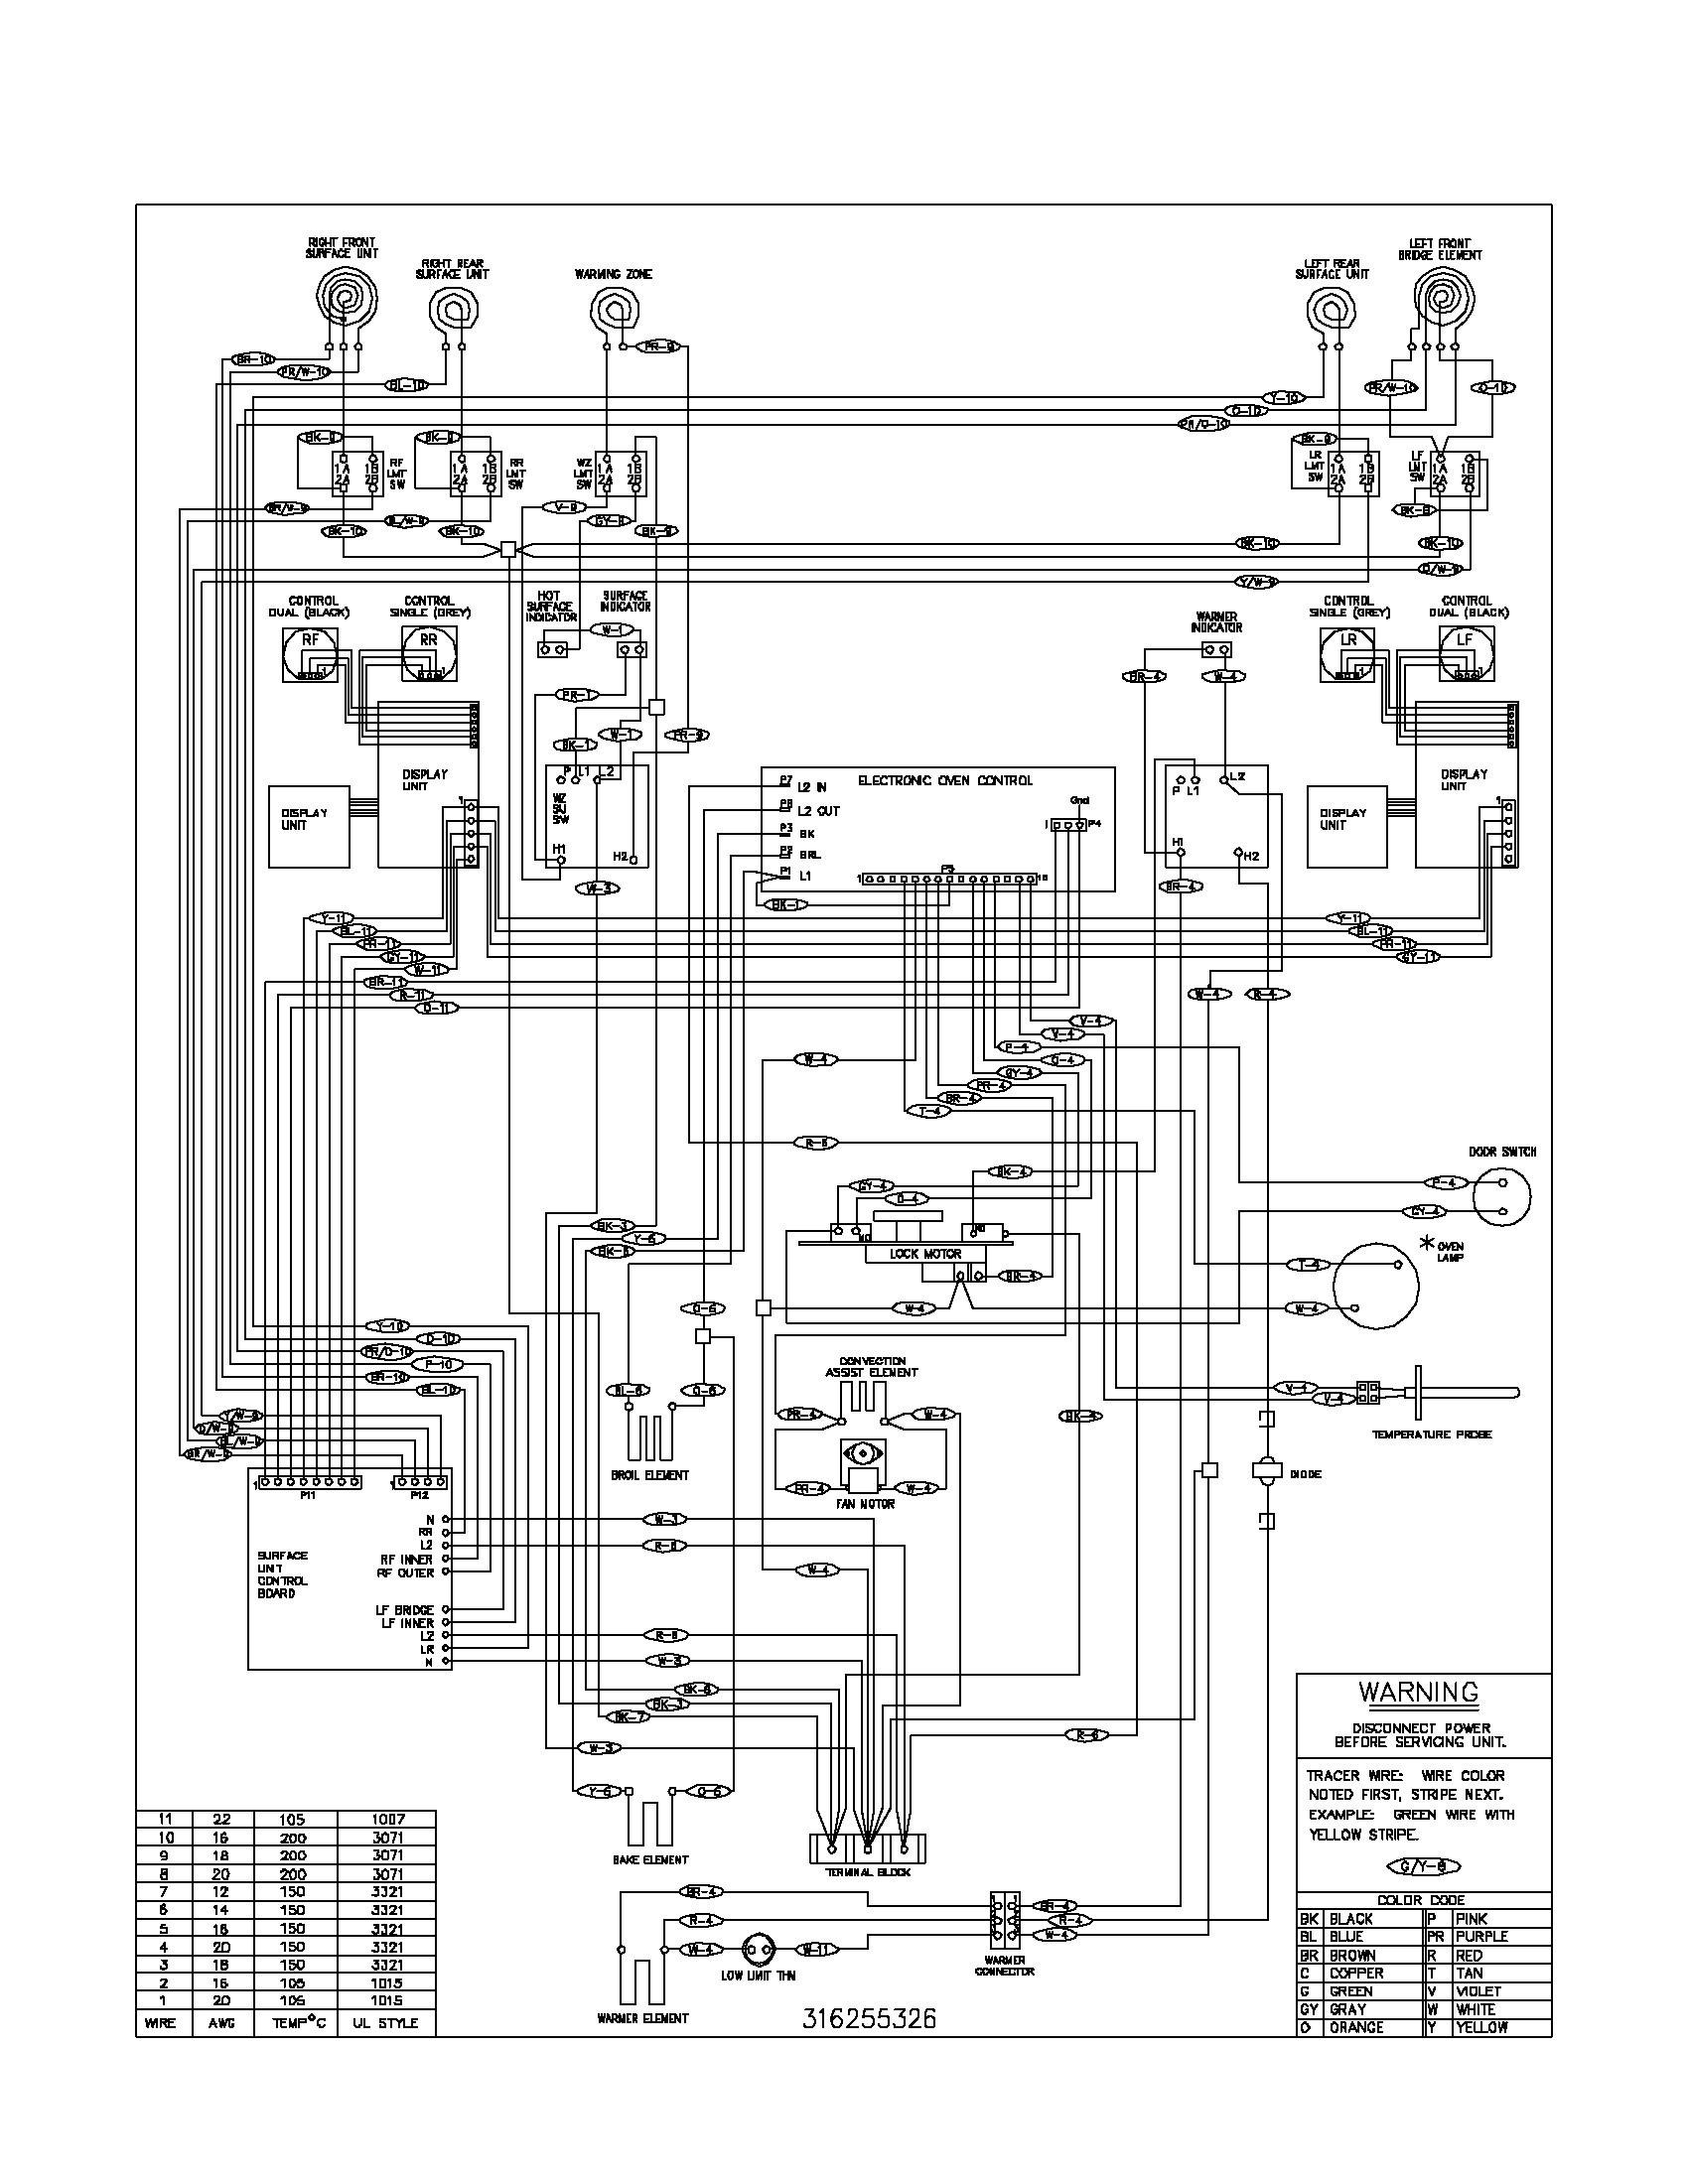 Intertherm Electric Furnace Wiring Diagram Book Of Wiring Diagram - Intertherm Electric Furnace Wiring Diagram